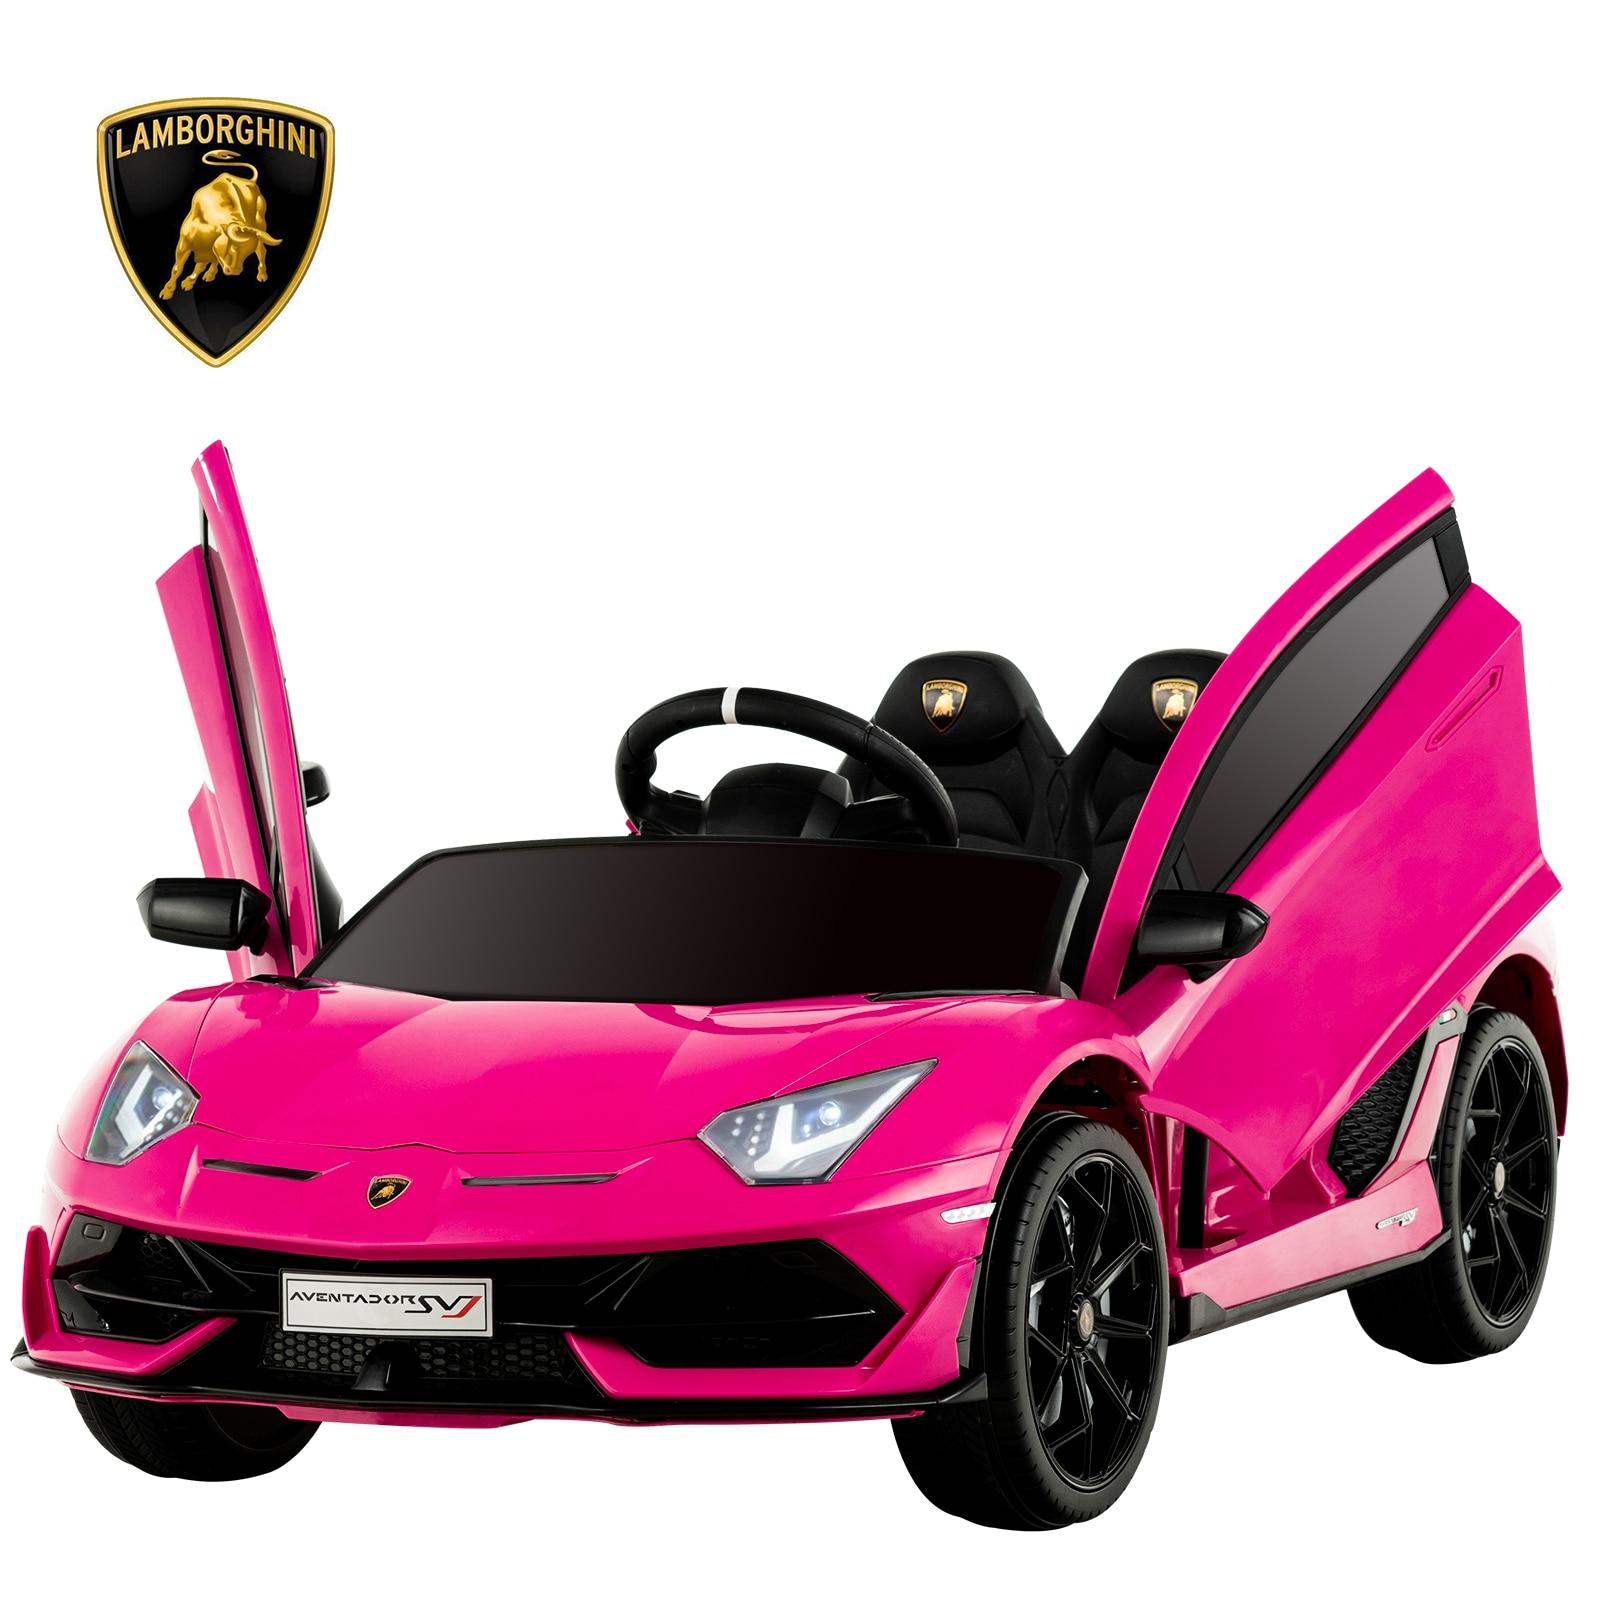 Uenjoy 12V Kids Electric Ride On Car Lamborghini Aventador SVJ Motorized Vehicles With Remote Control, Battery Powered, LED Ligh